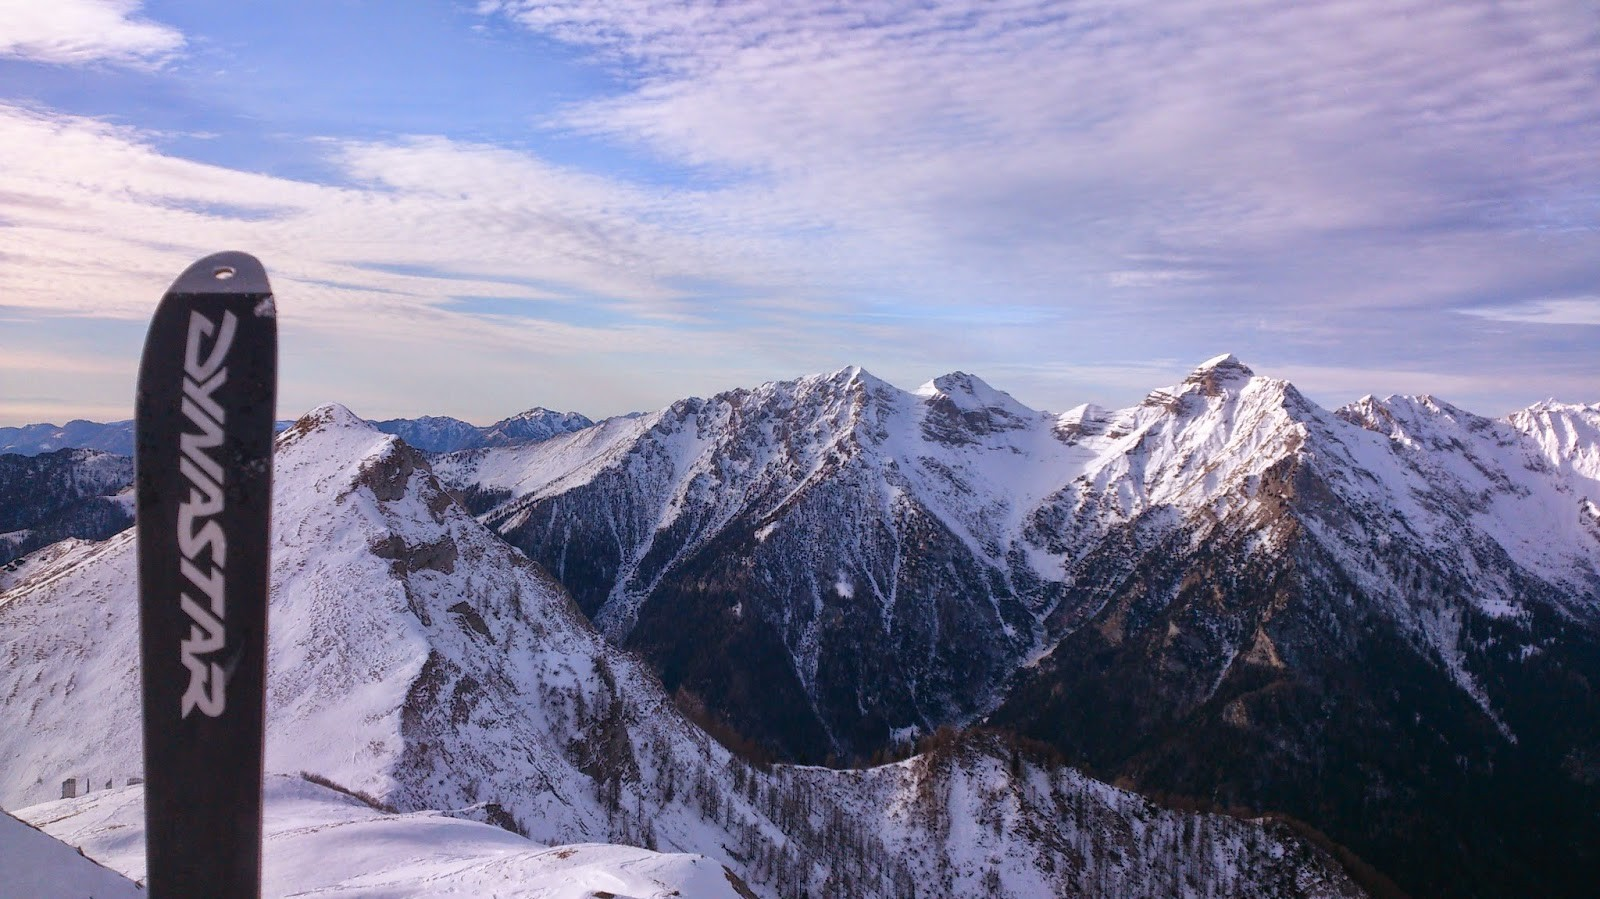 Monte Valgussera